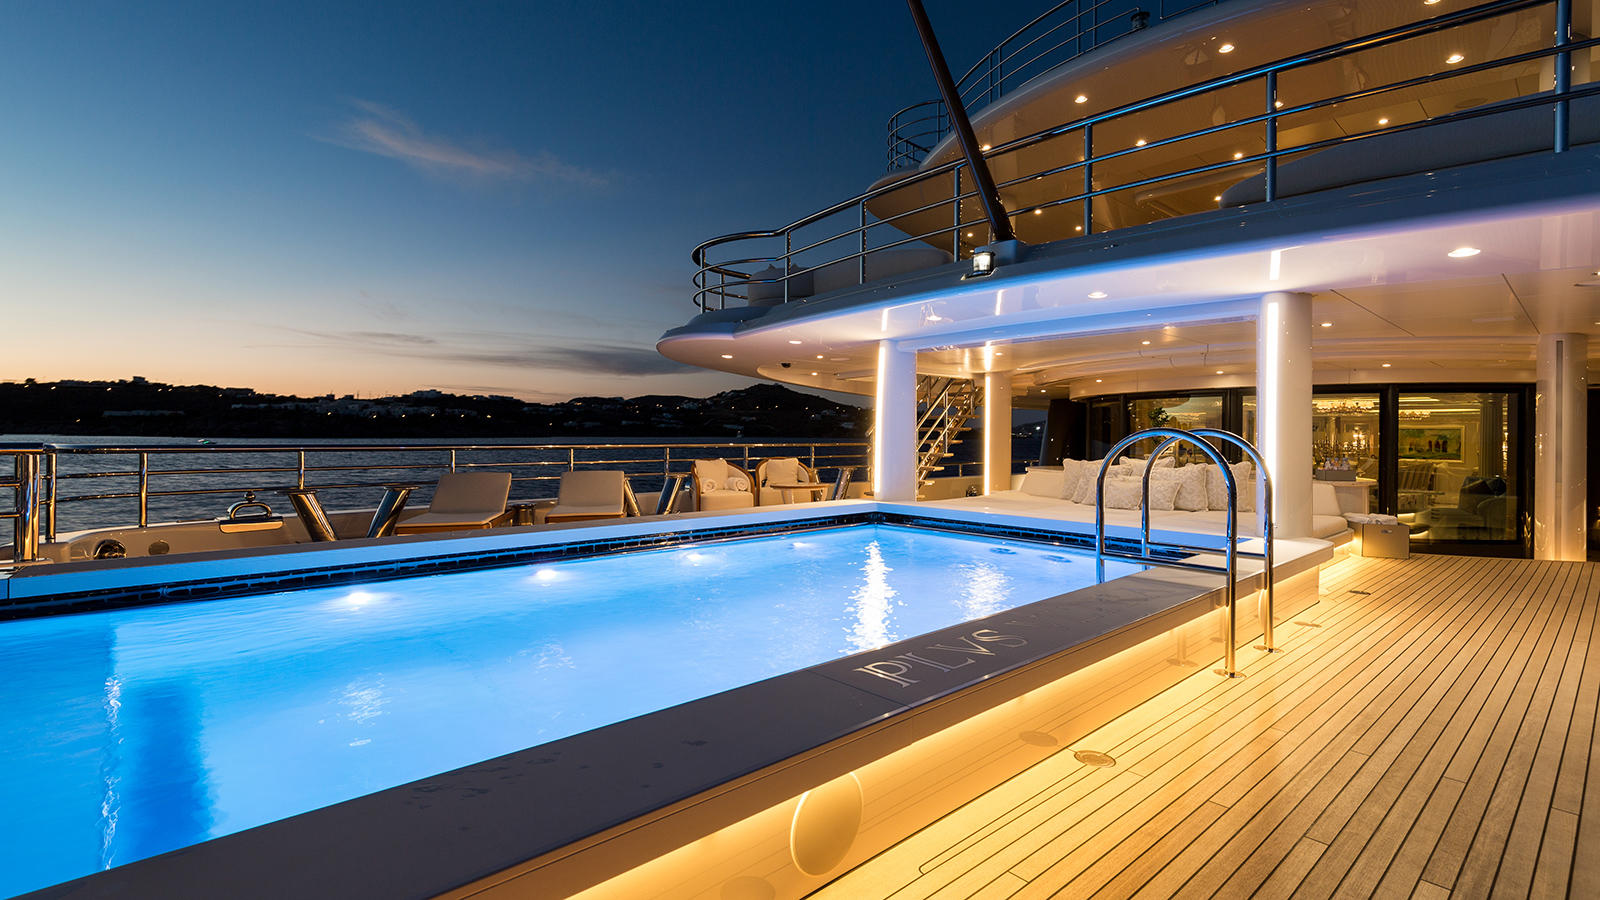 xILXMpQpR6ifH5NPF8Xn_Plvs-Vltra-Amels-LE242-yacht-pool-credit-Jeff-Brown-1920x1080